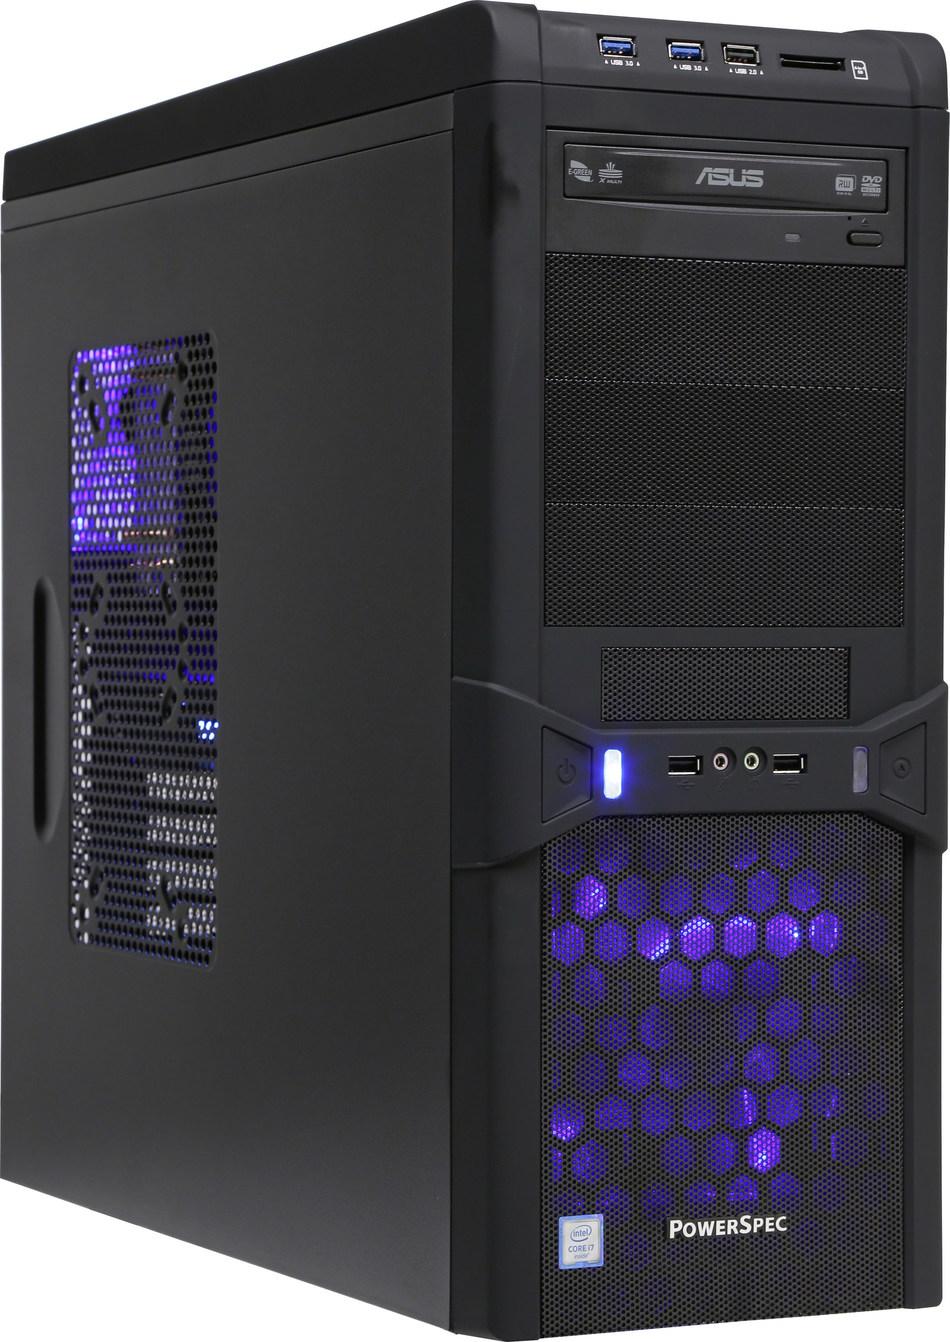 Micro Center's PowerSpec G740 PC with AMD Ryzen 1700X  CPU